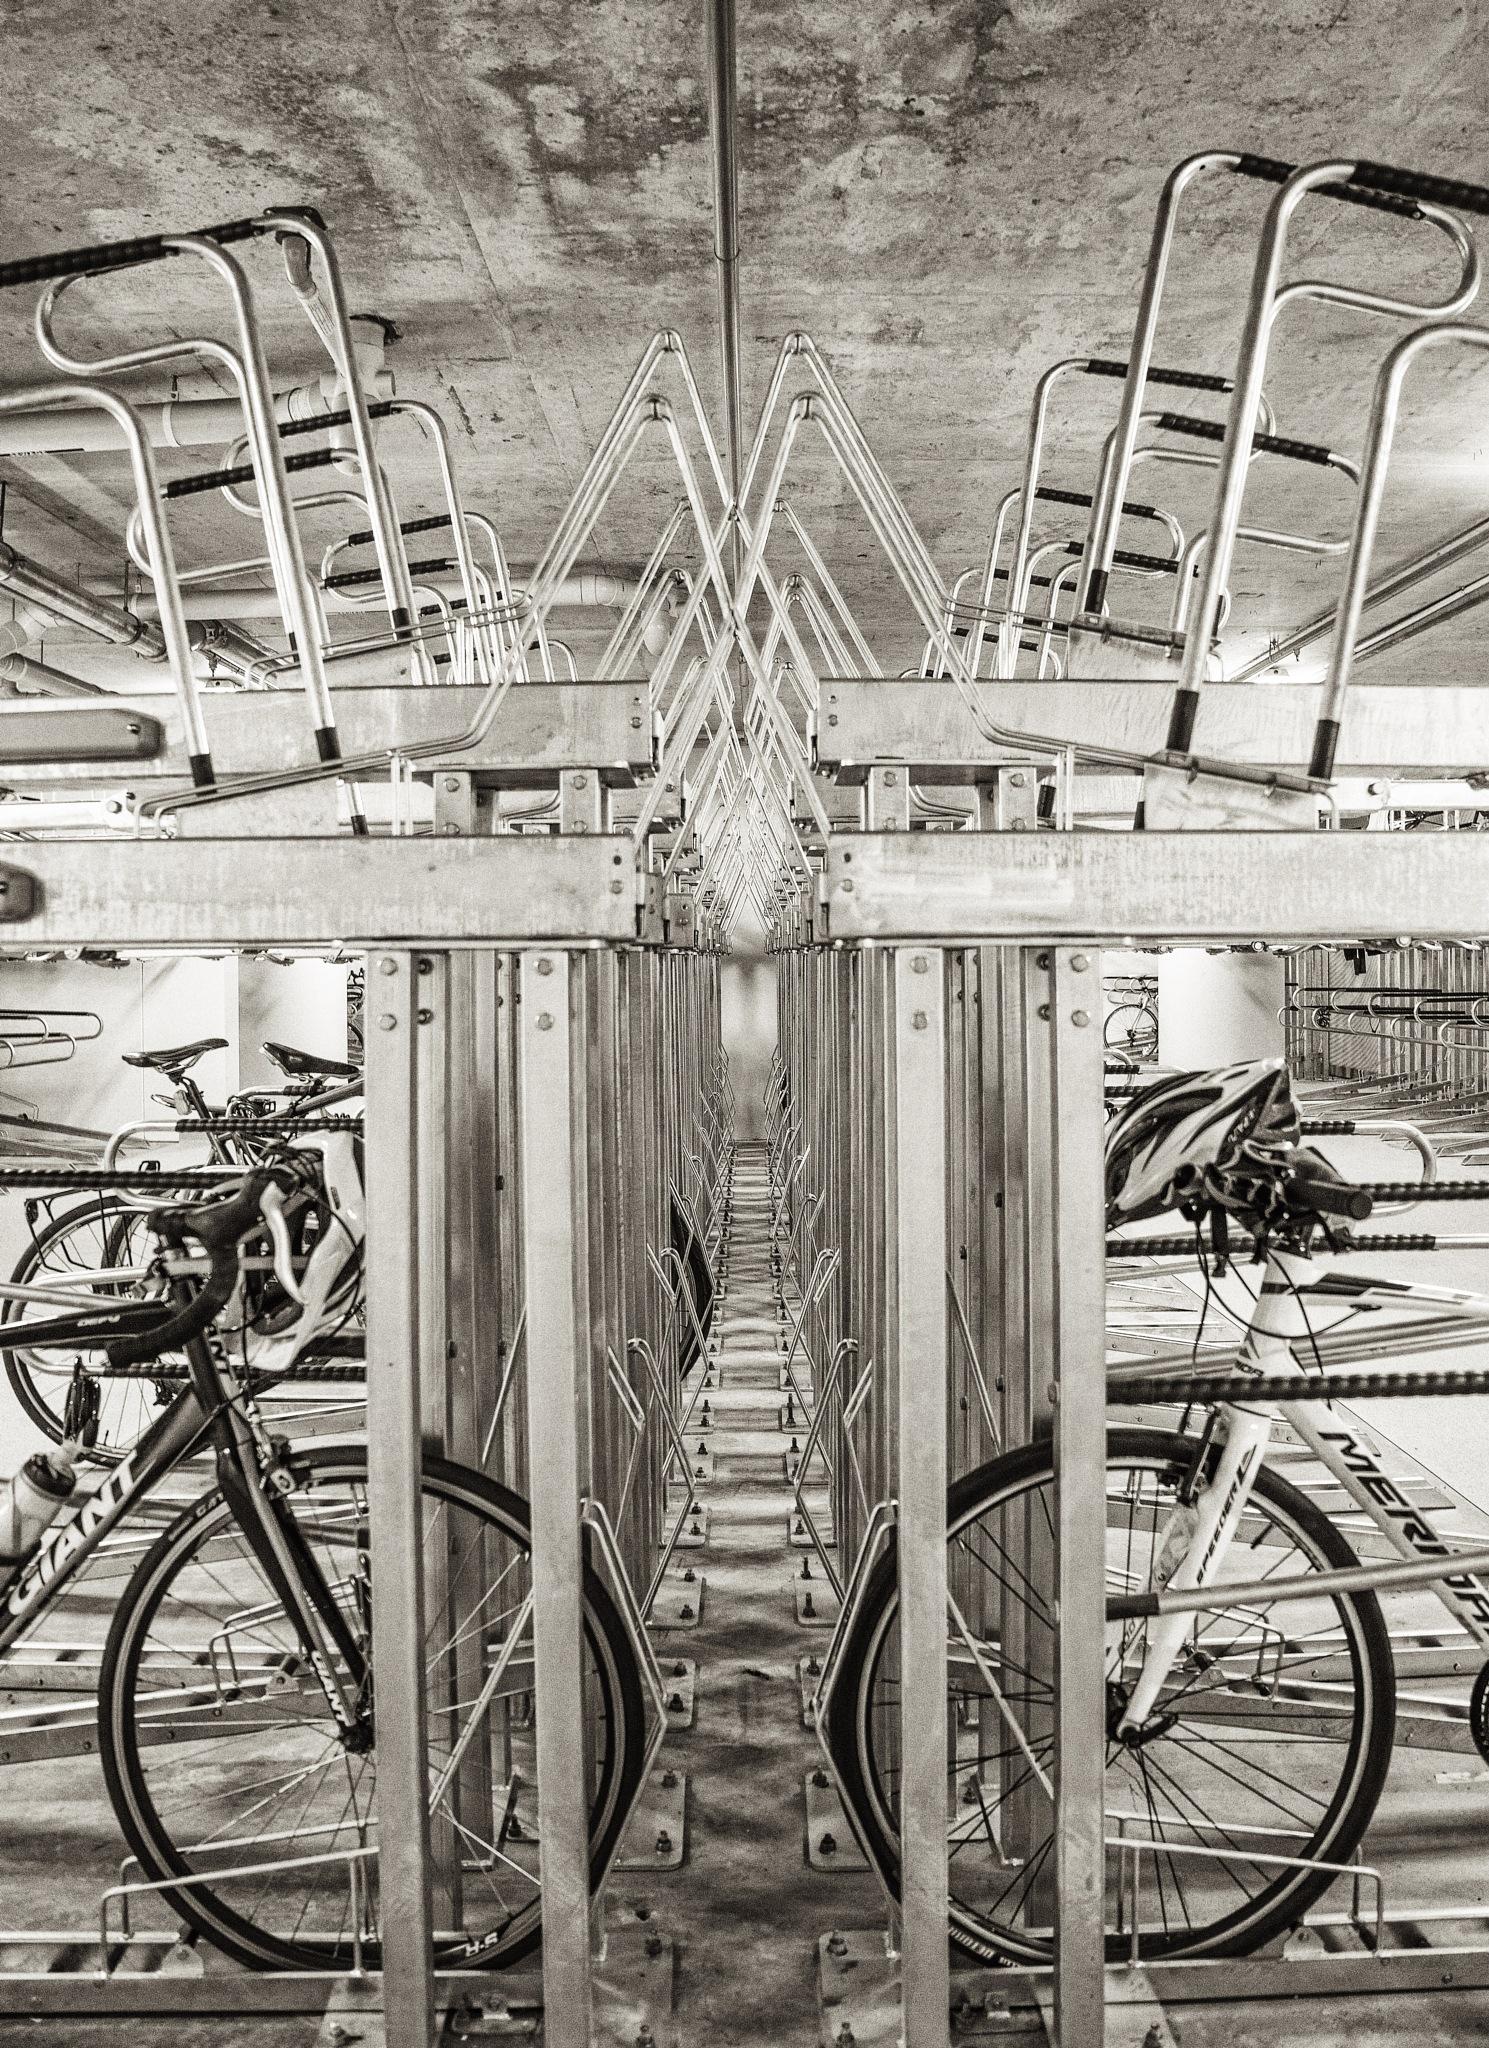 Row Upon Row. by ensbassatt